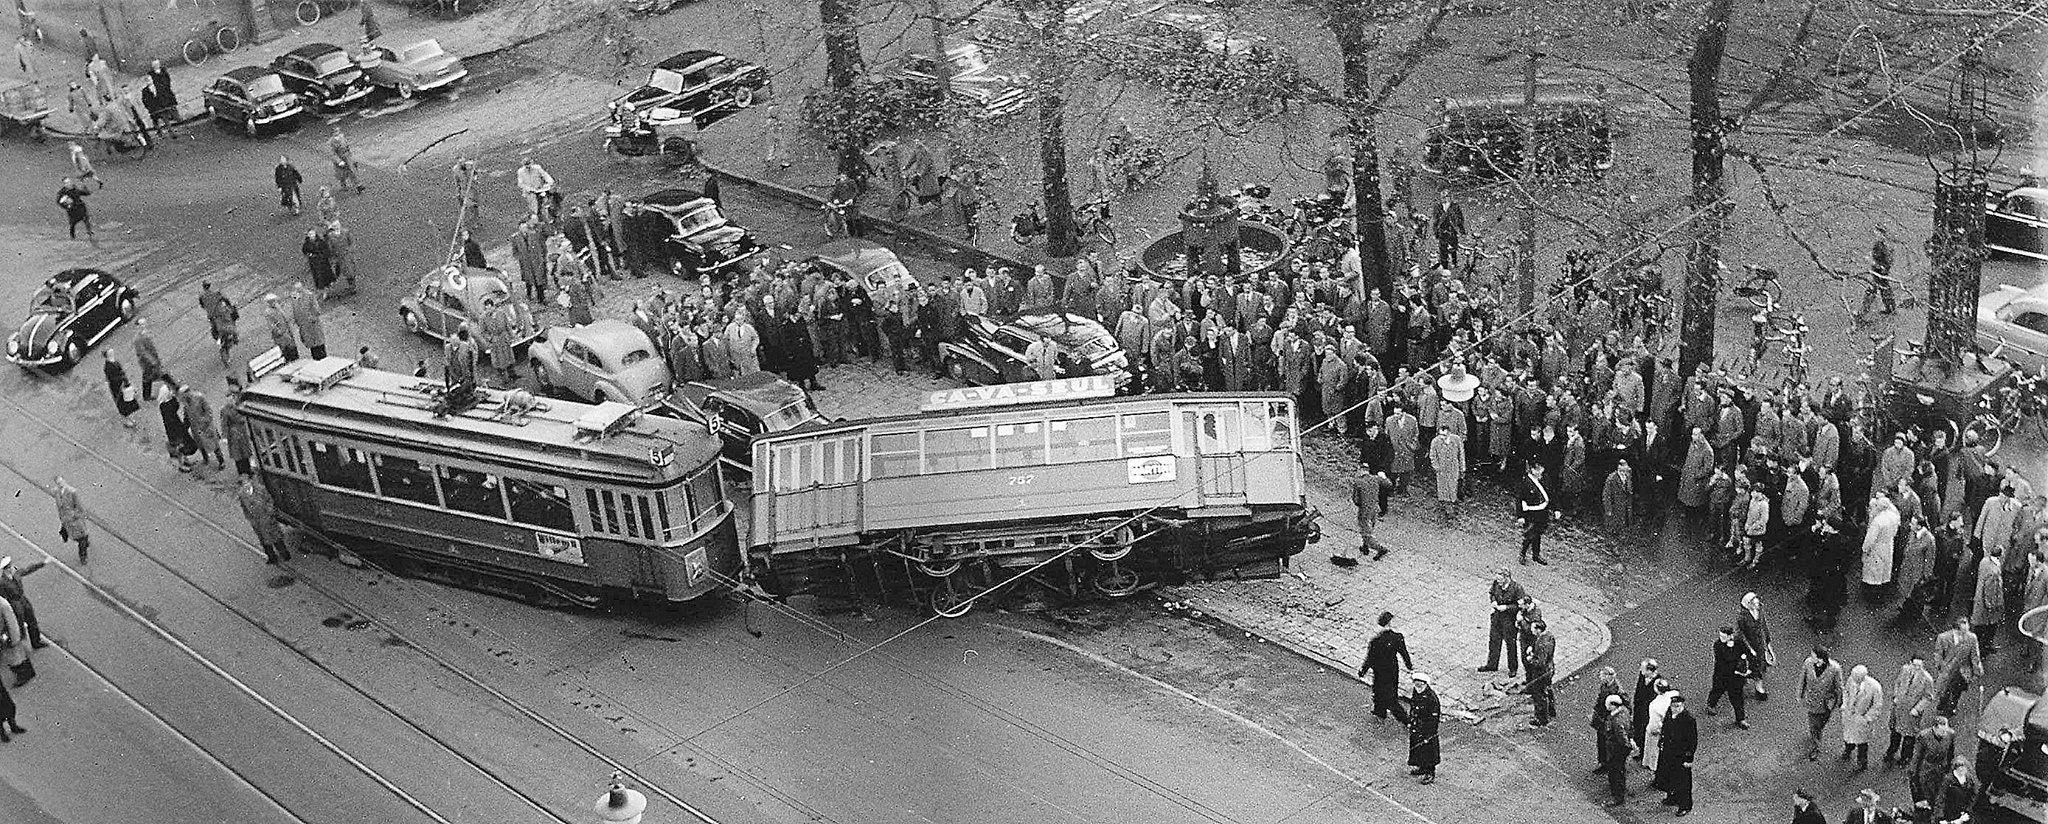 Tram ongeluk, Beursplein. | Amsterdam, Gebouwen